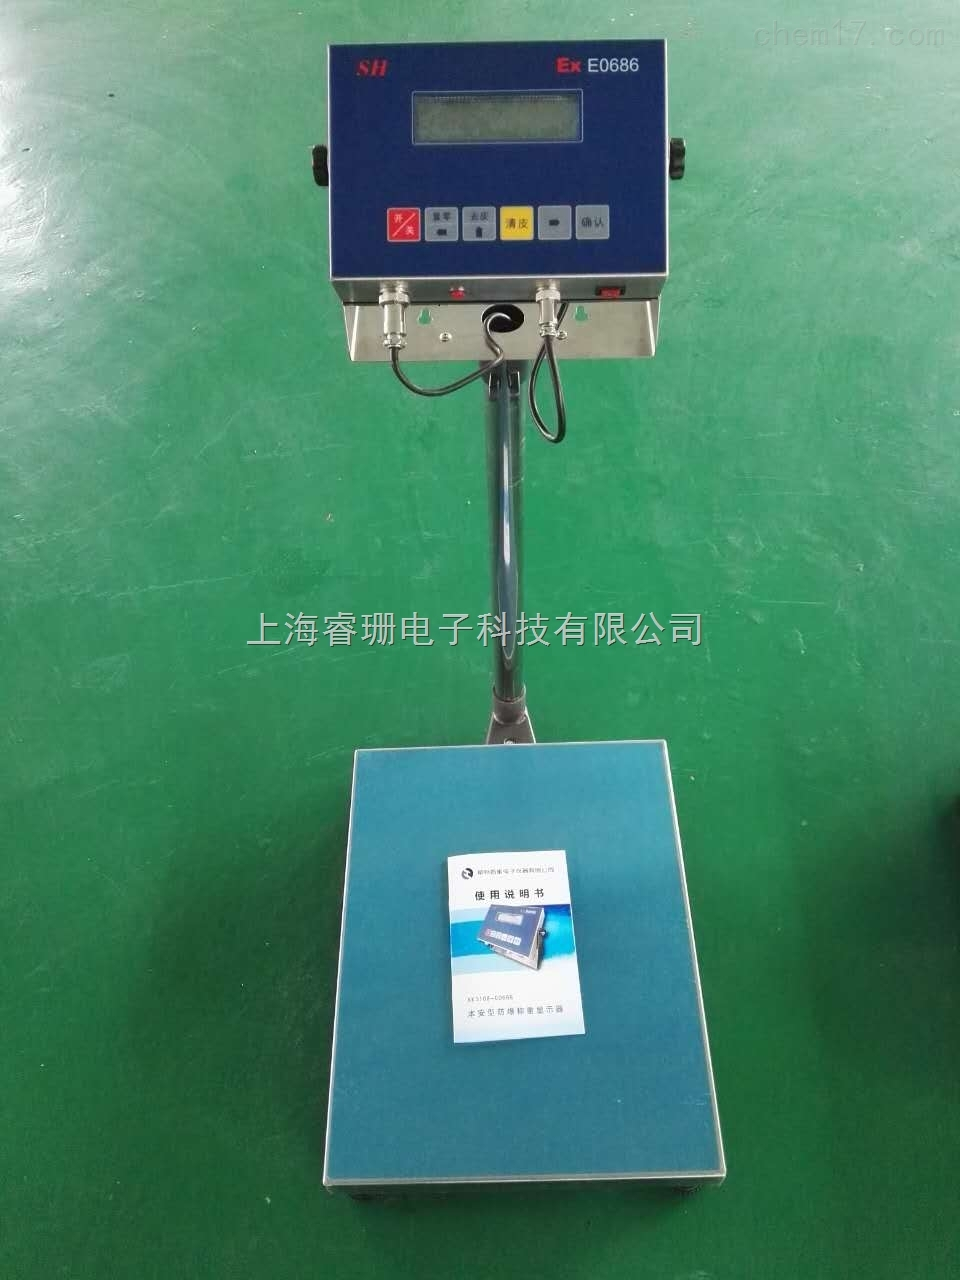 60kg防爆电子台秤厂家 防爆电子秤多少钱